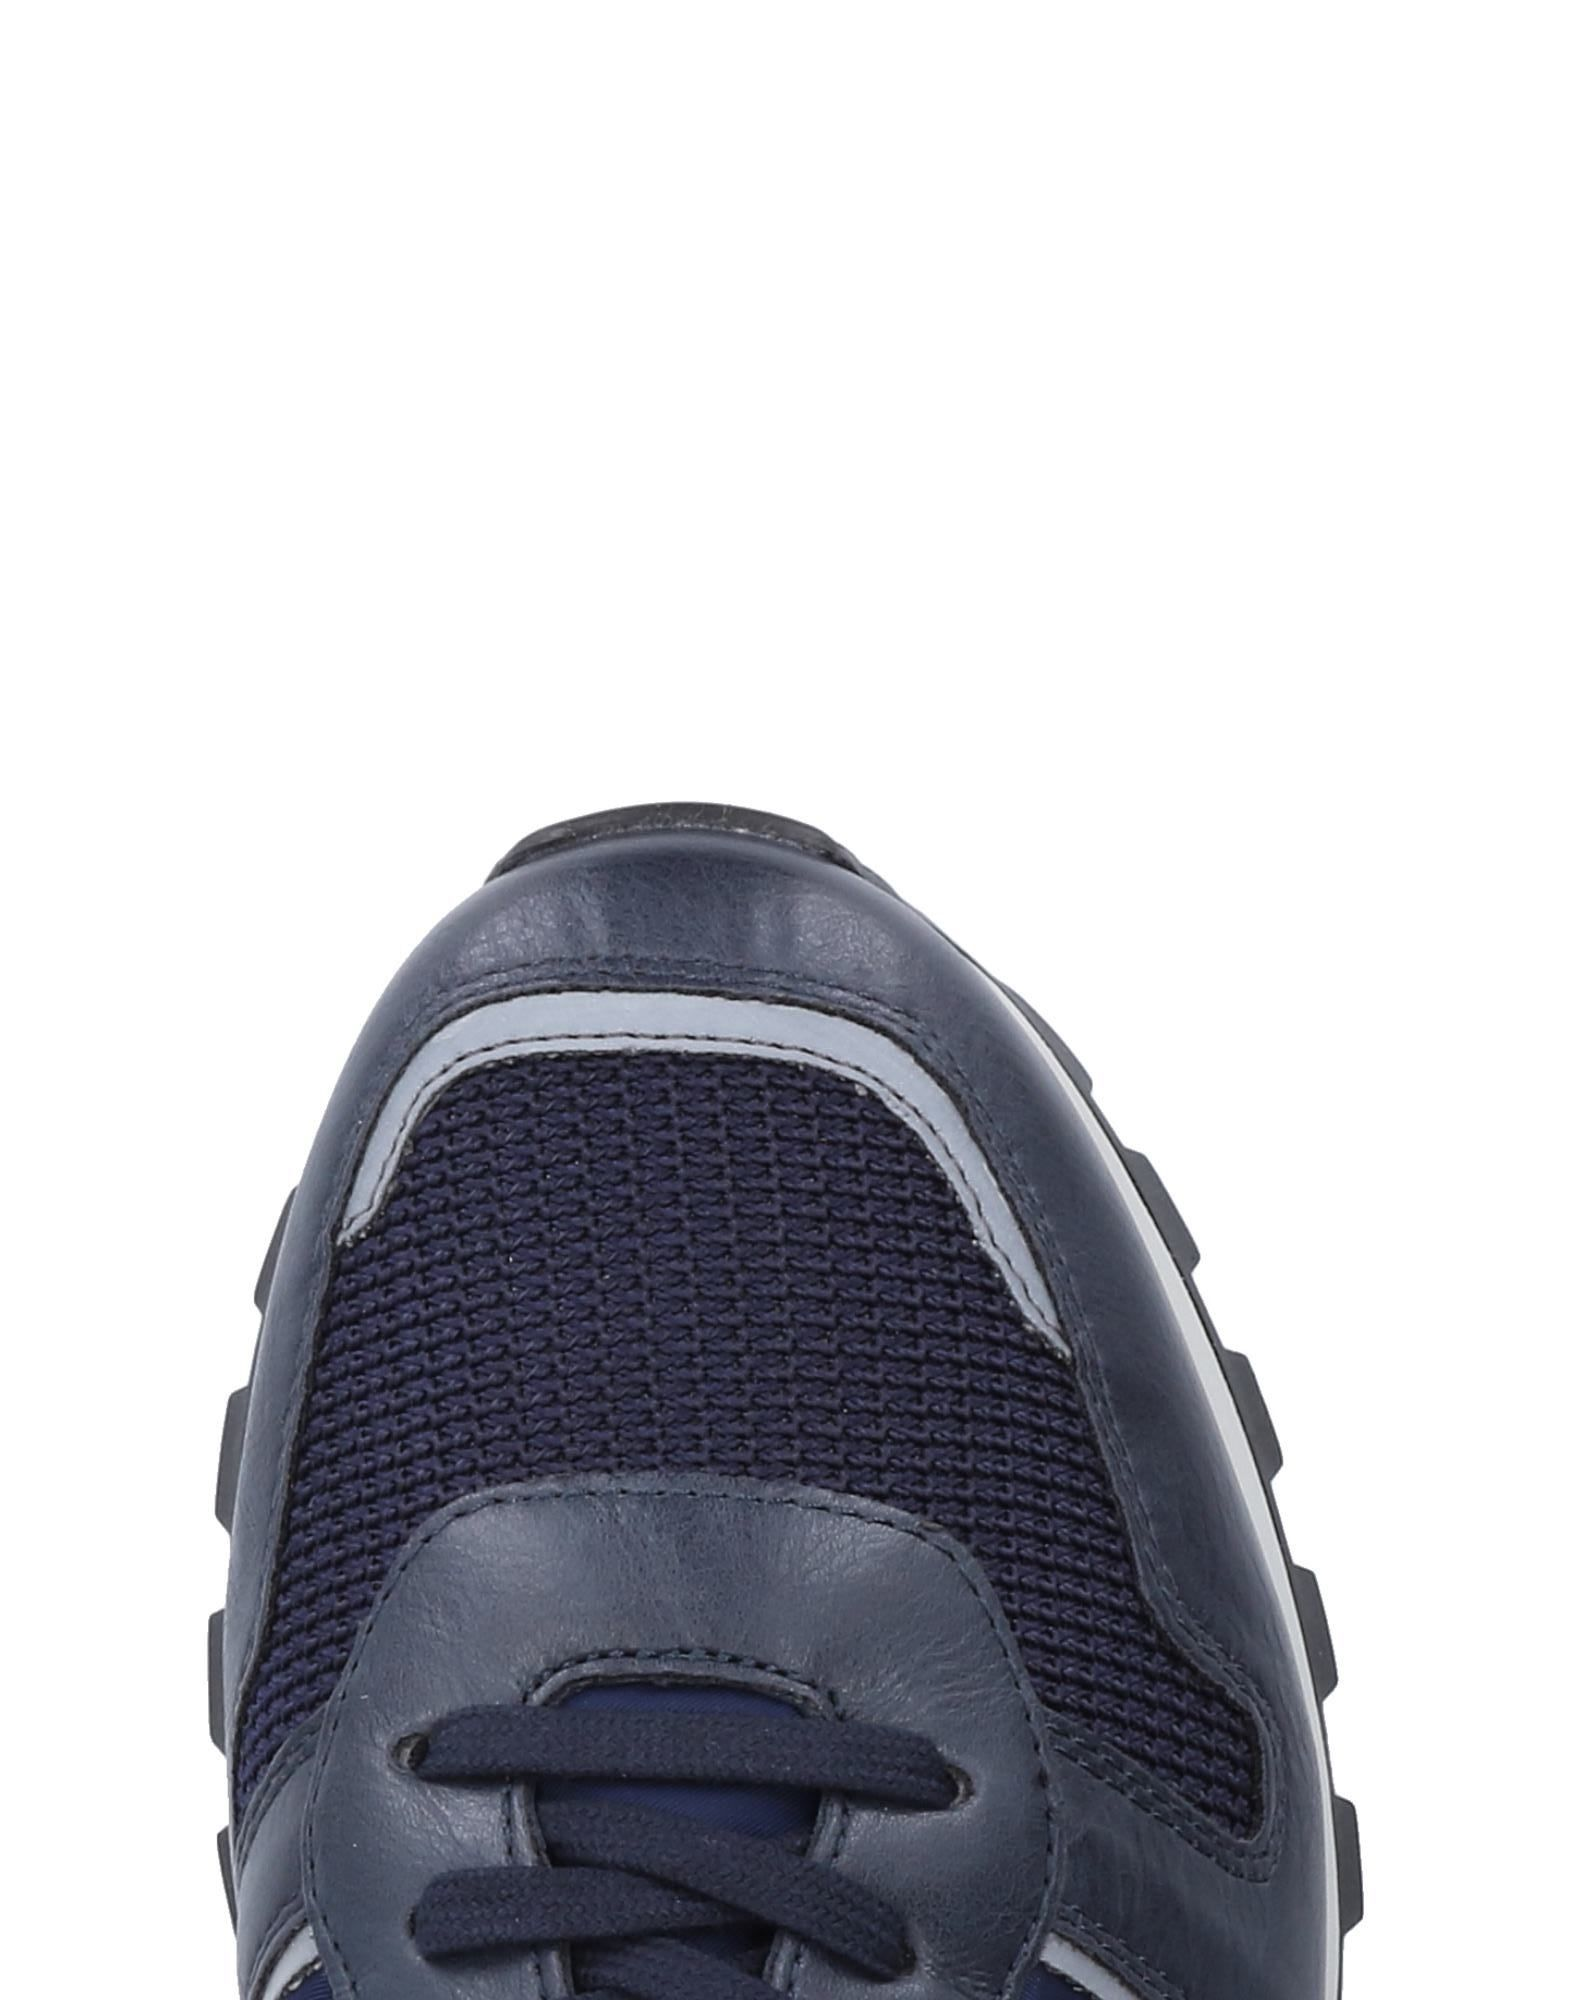 Haltbare Mode billige Schuhe Bikkembergs Sneakers Herren  11521962TG Heiße Schuhe Schuhe Heiße 9cca67